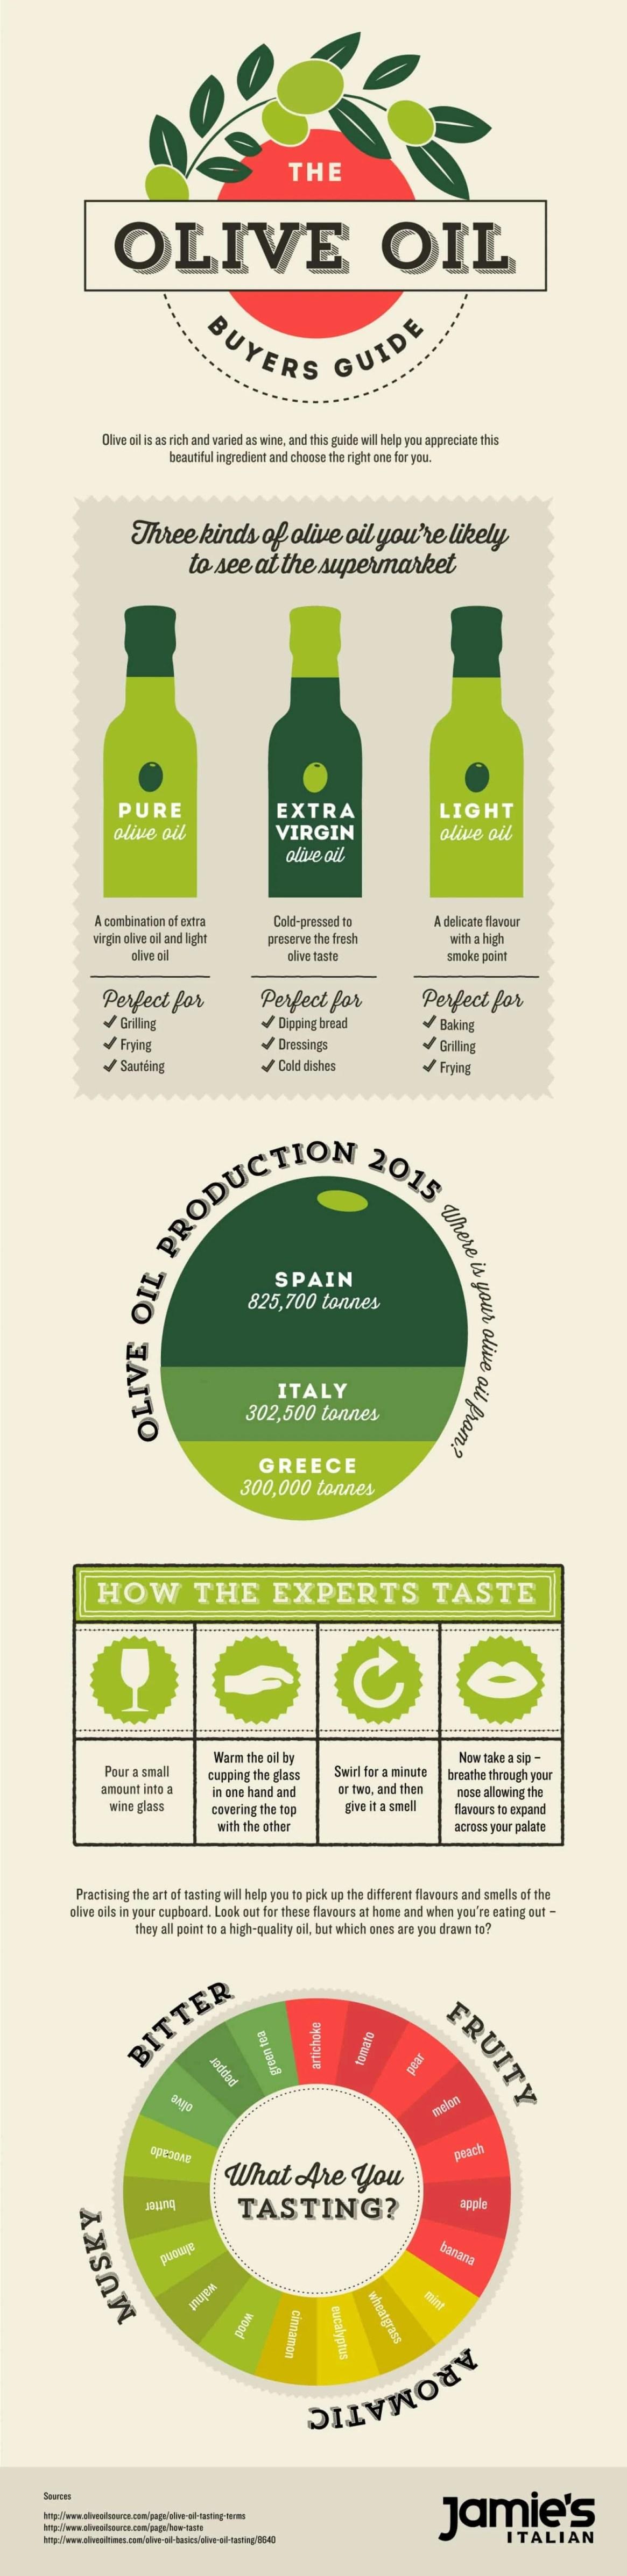 Jamie's Italian, Olive Oil Buyers Guide